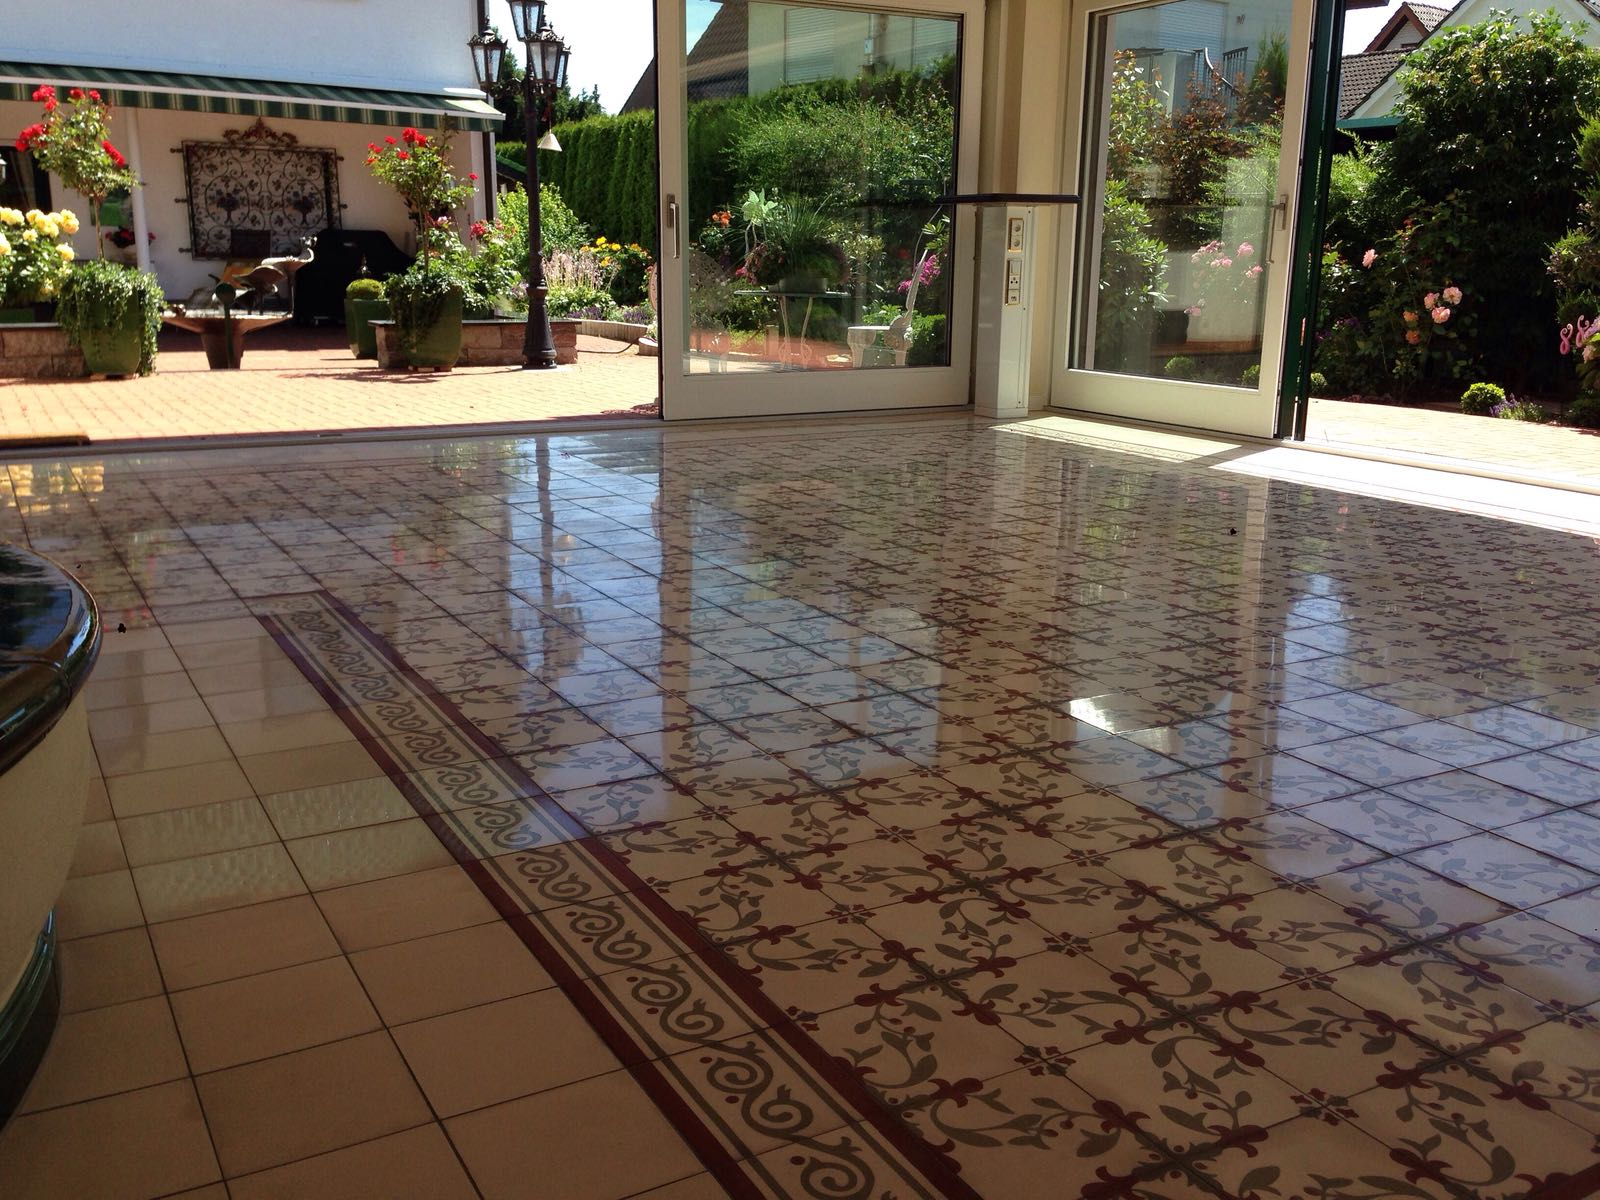 Mosaikfliesen | Rcs-Steinbodensanierung